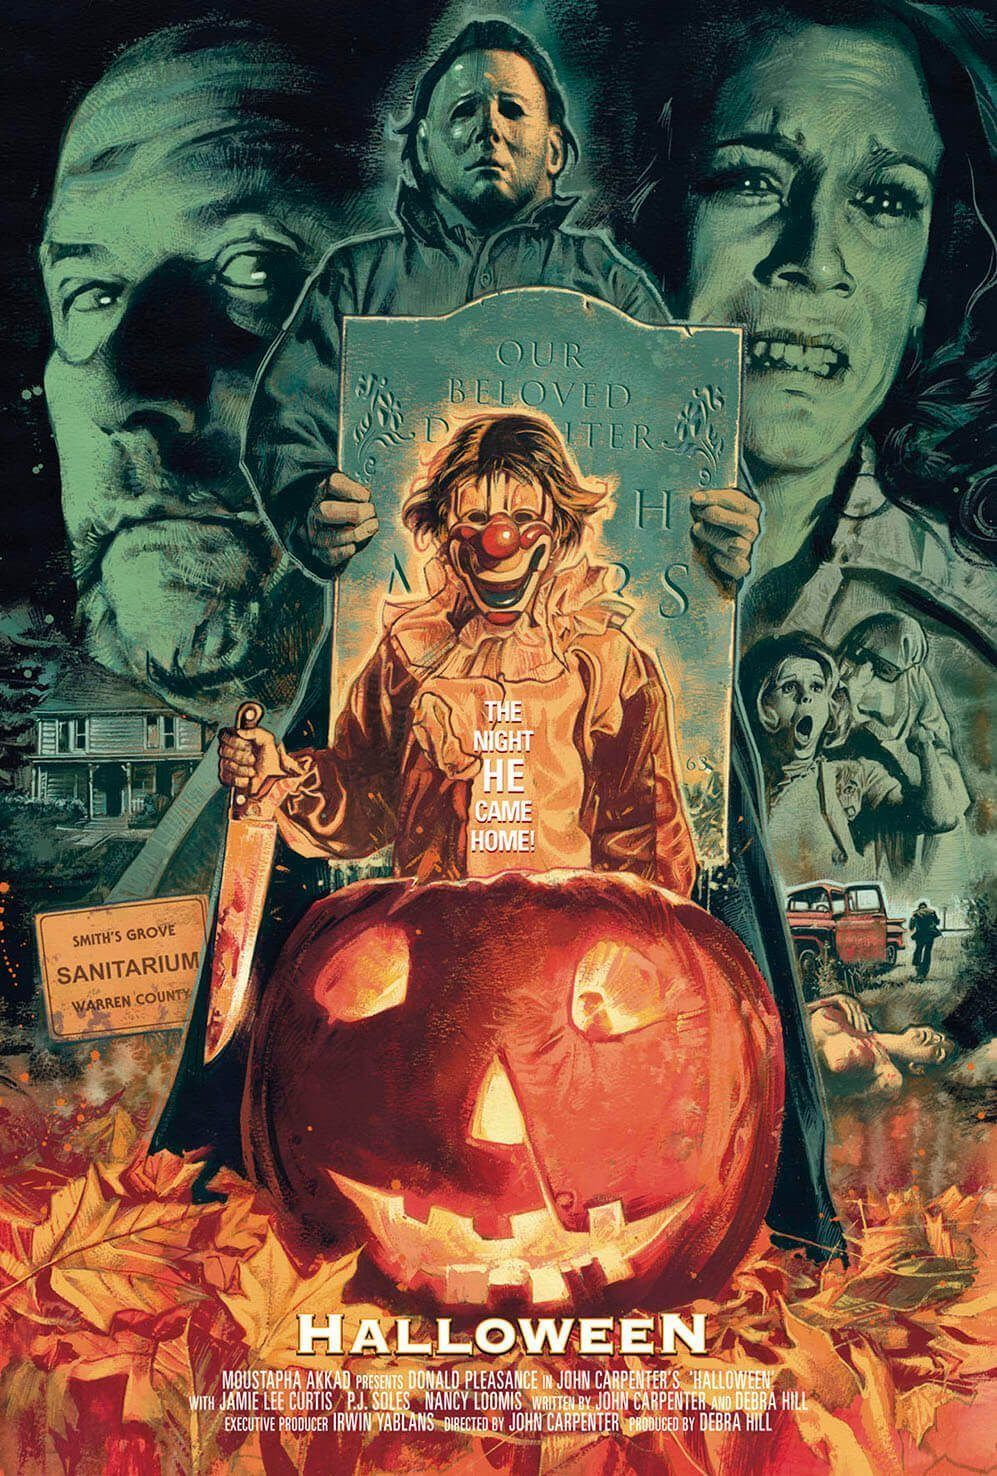 Halloween 1978 Wallpaper.Halloween 1978 Poster Art 997x1476 Wallpaper Teahub Io